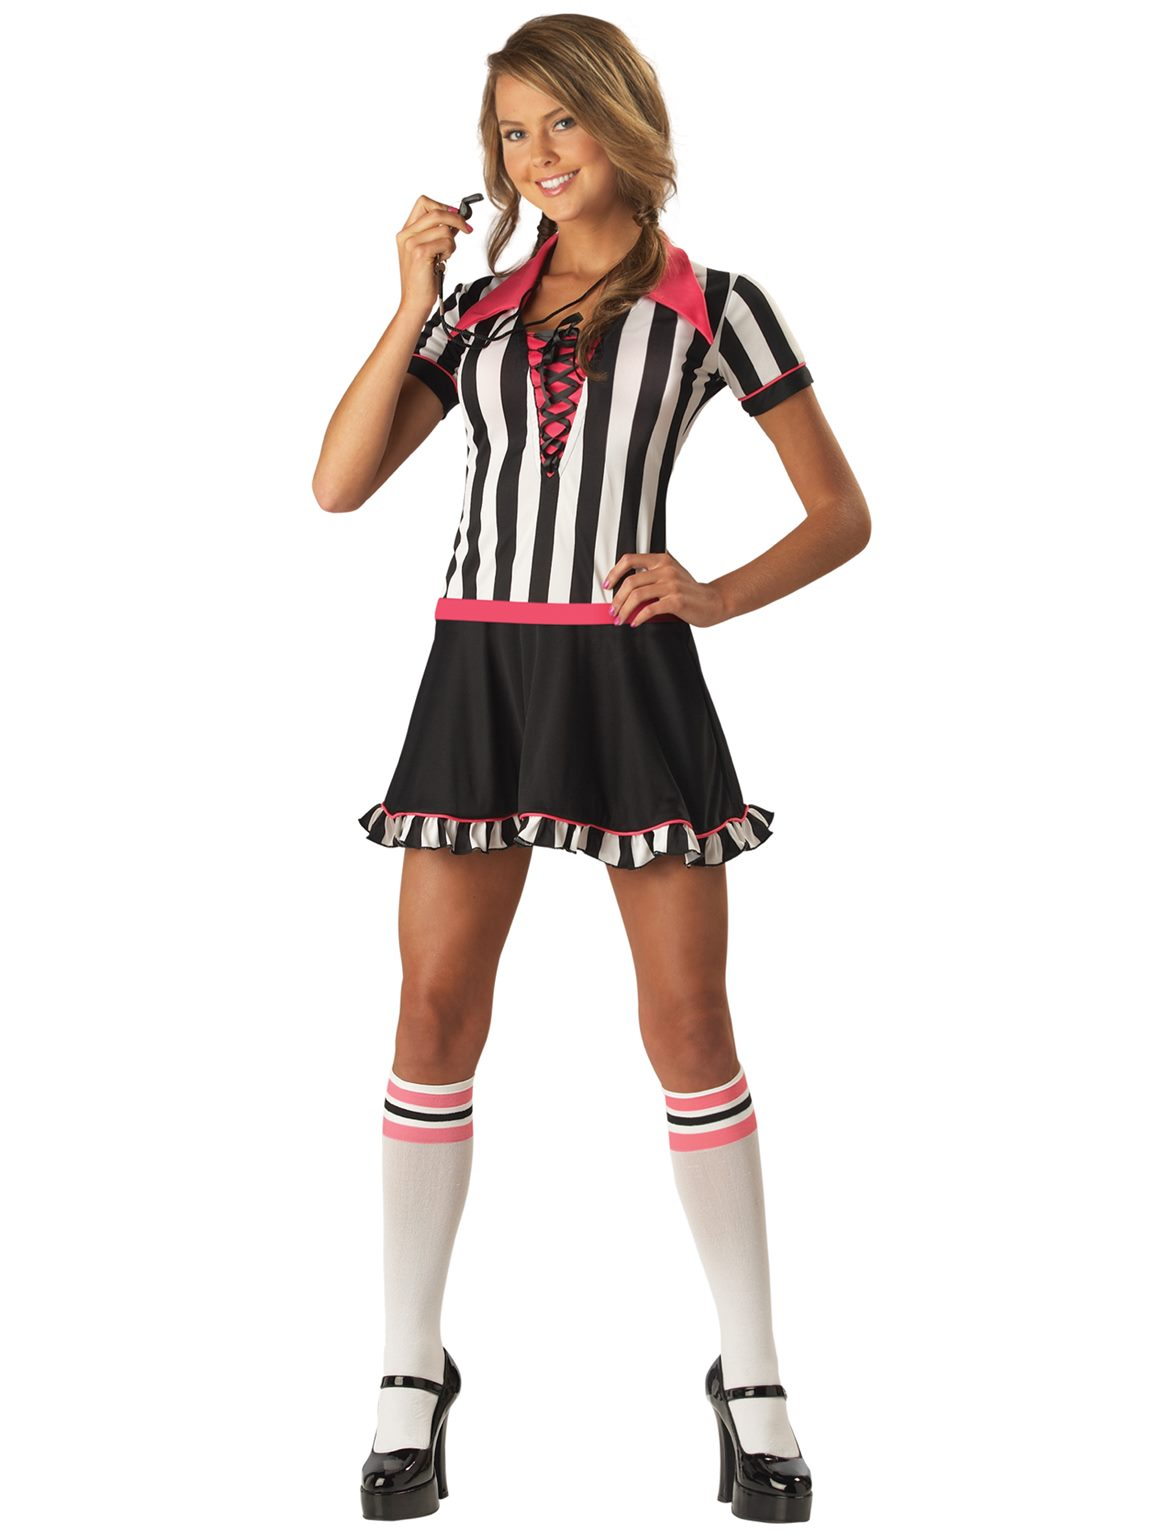 228aa3eb5 Racy Referee Uniform Sports Umpire Football Soccer Teen Women ...